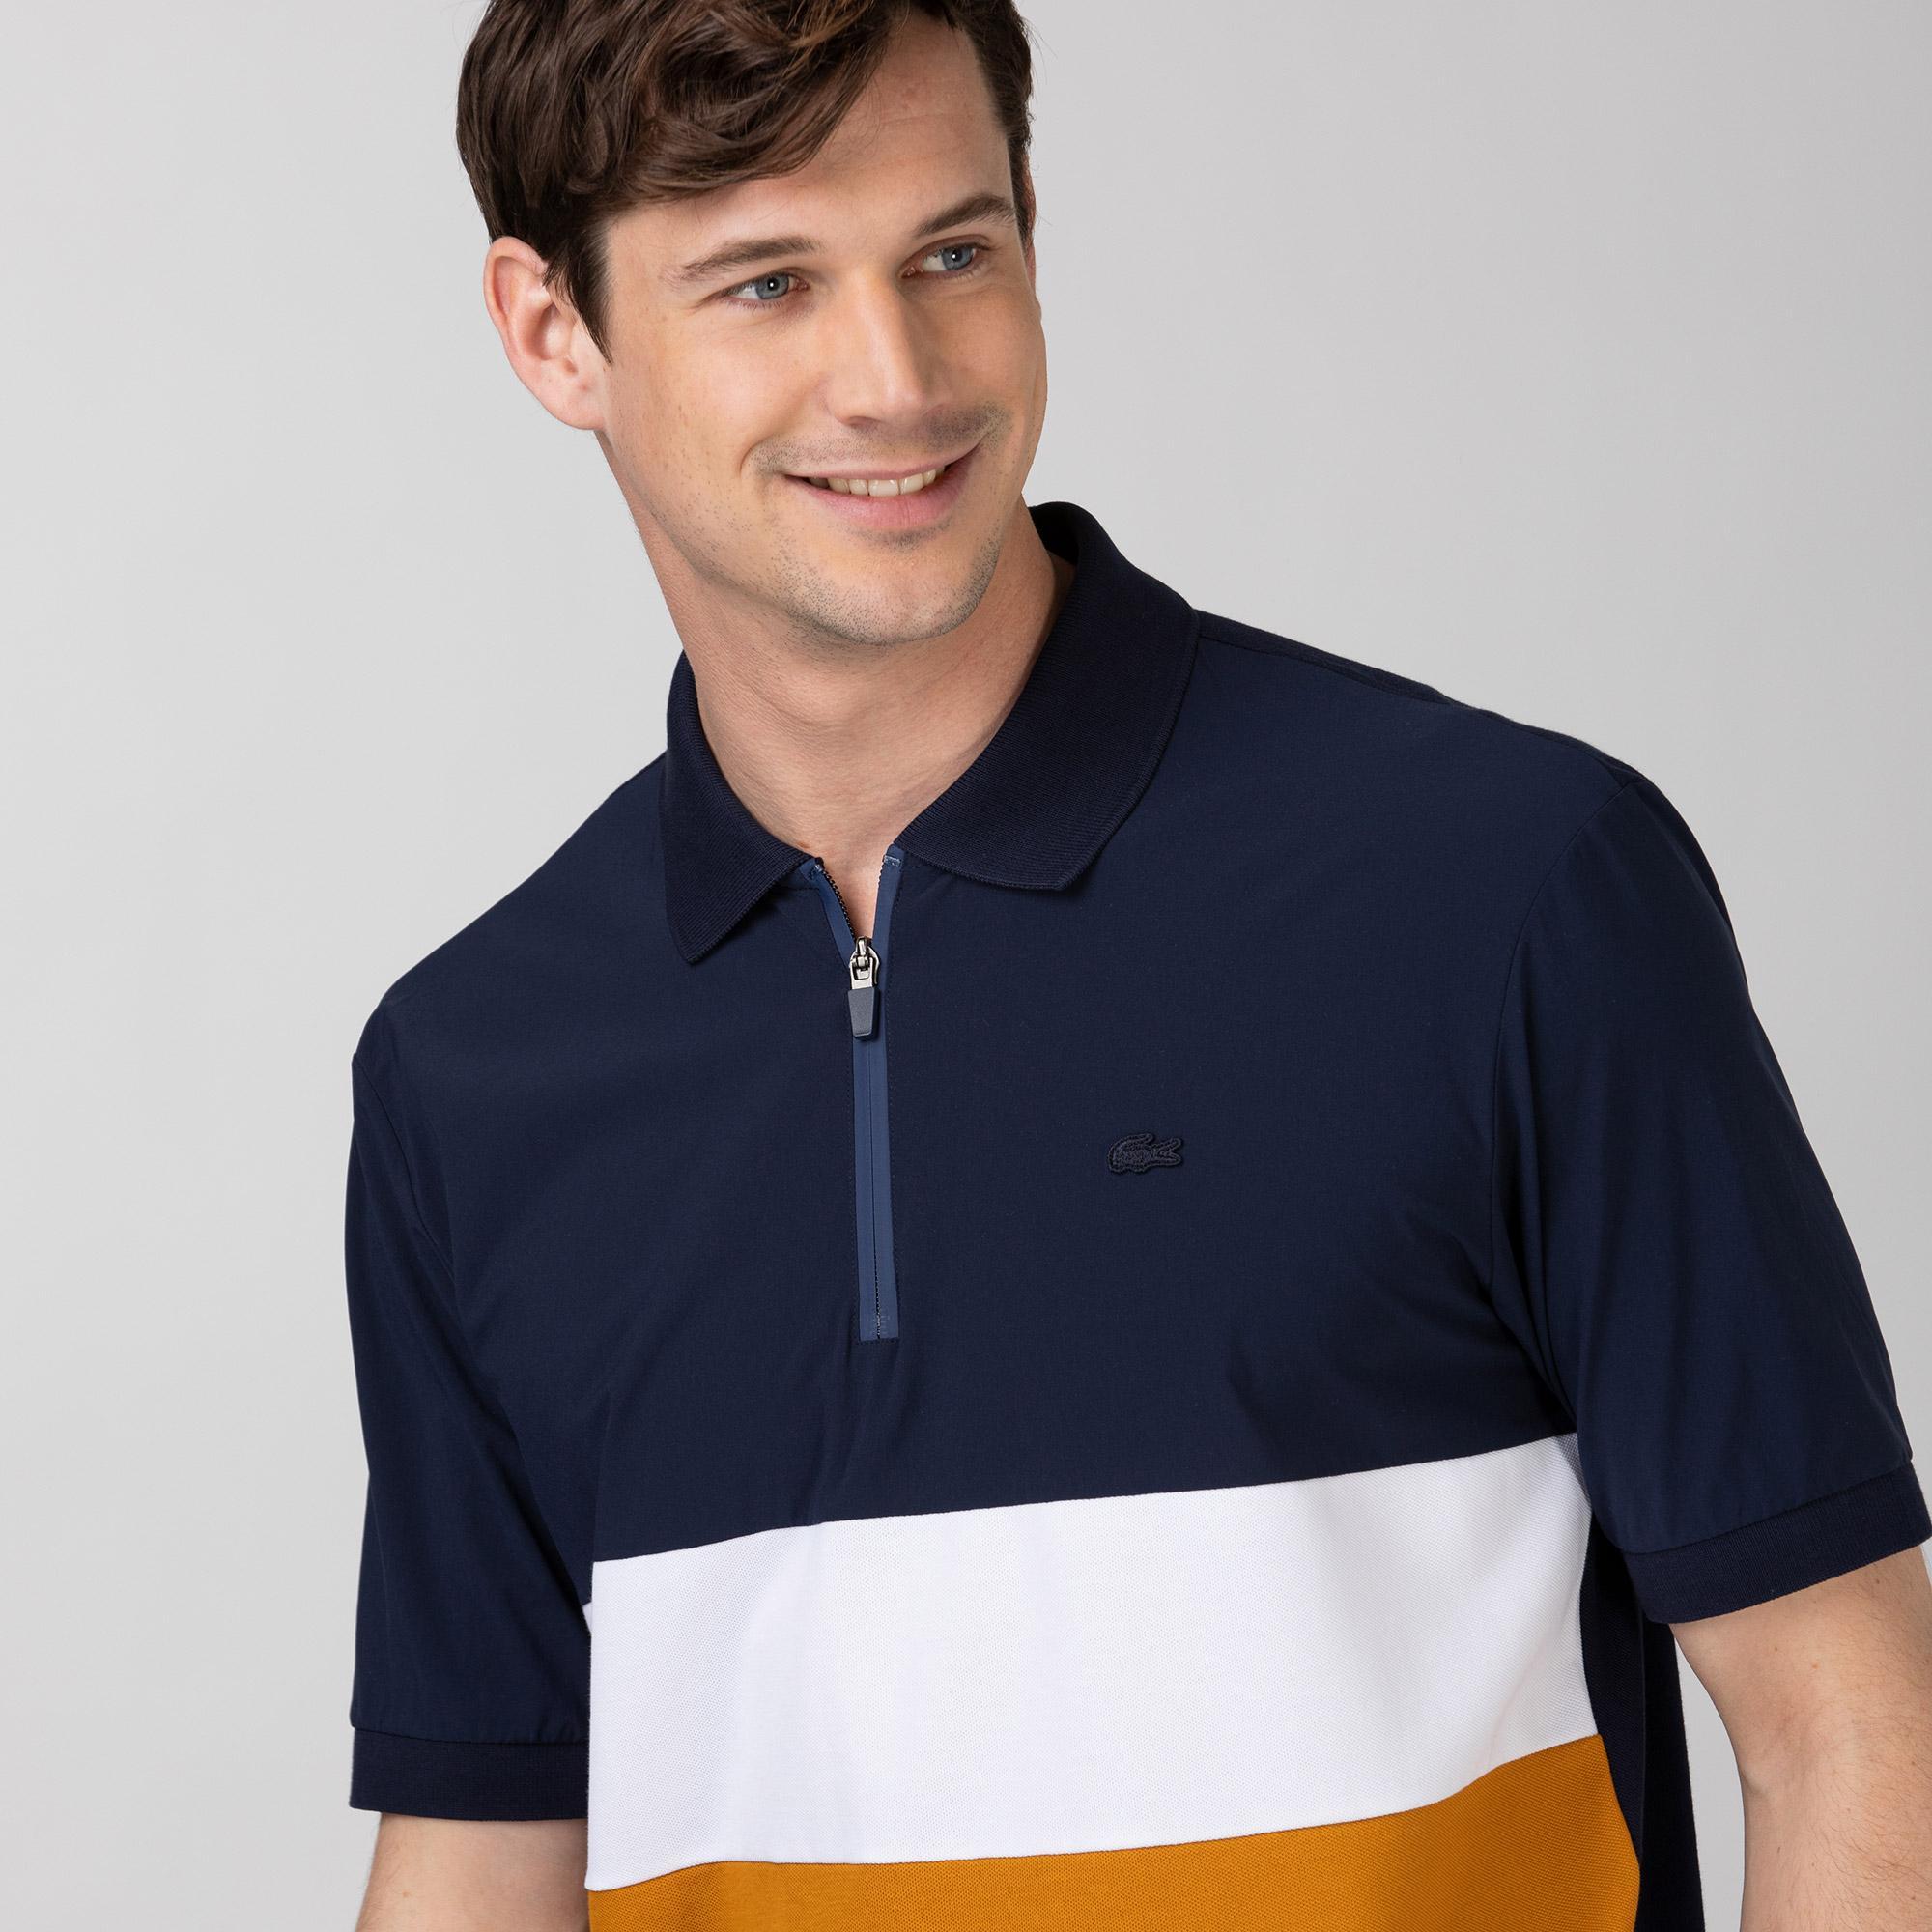 Lacoste Erkek Rahat Fit Fermuarlı Yaka Renk Bloklu Renkli Polo